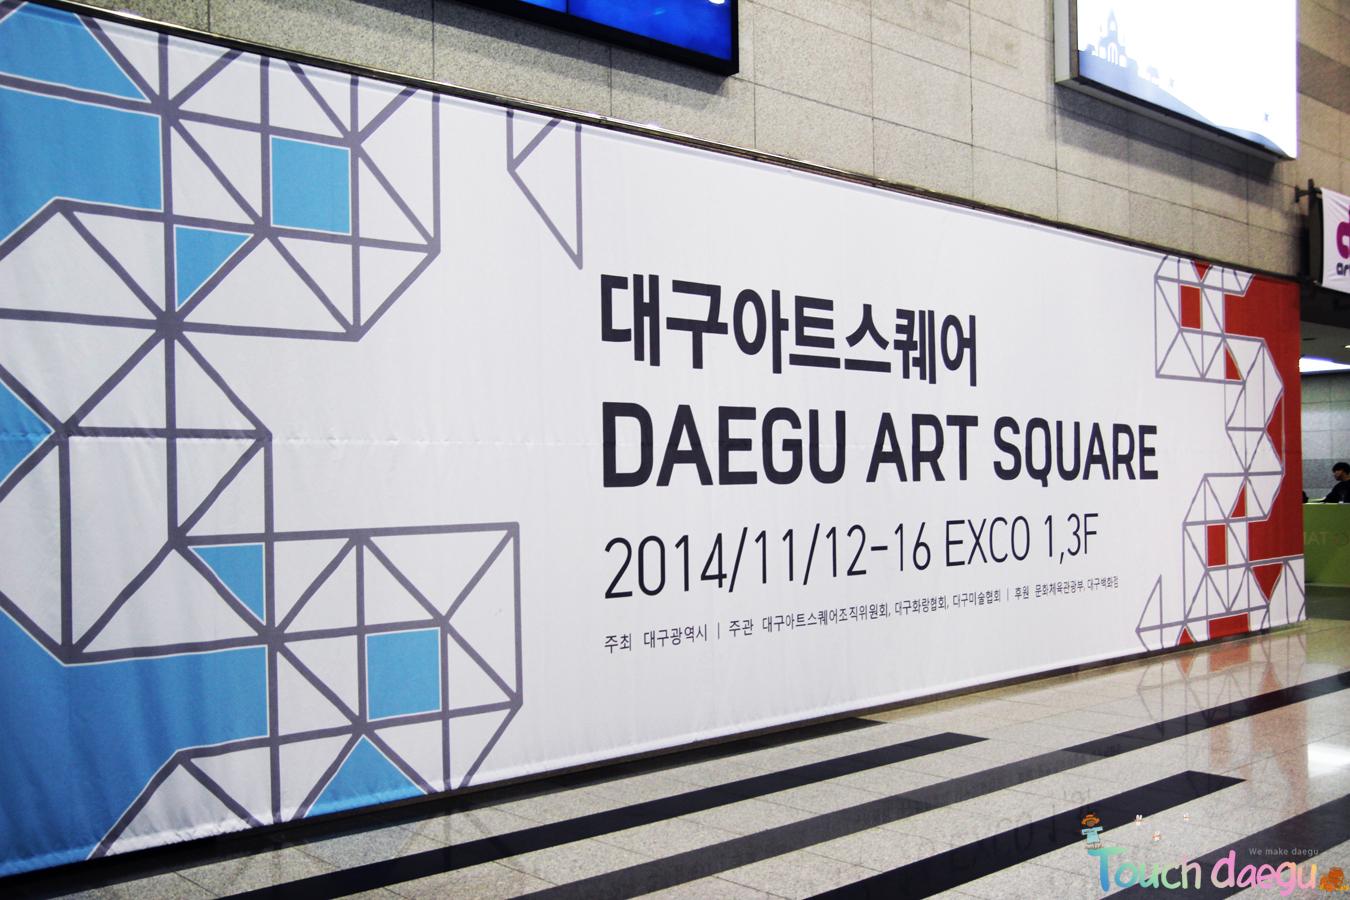 The entrance of Daegu Art Square